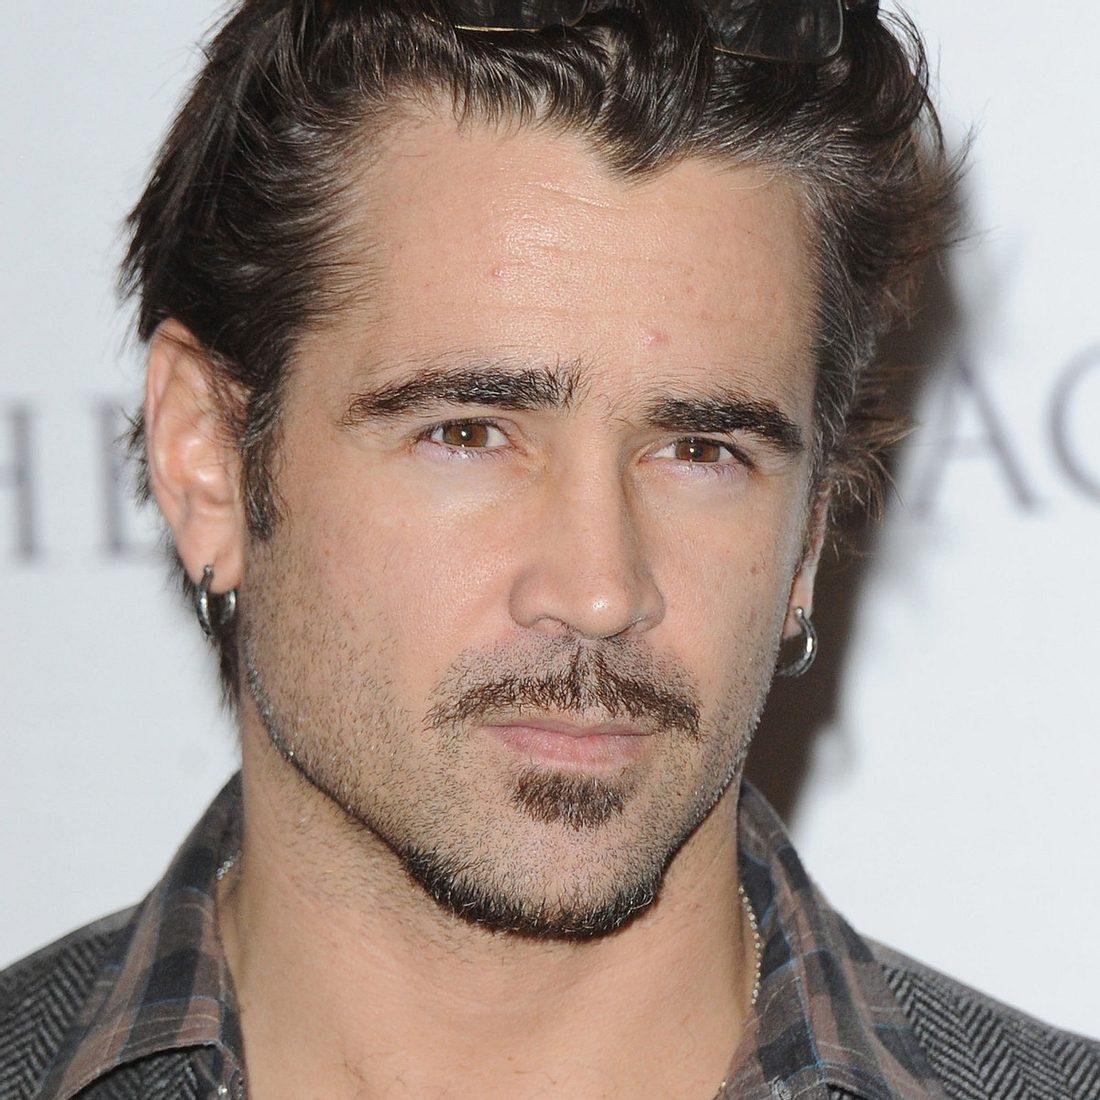 Colin Farrell sucht eine Freundin